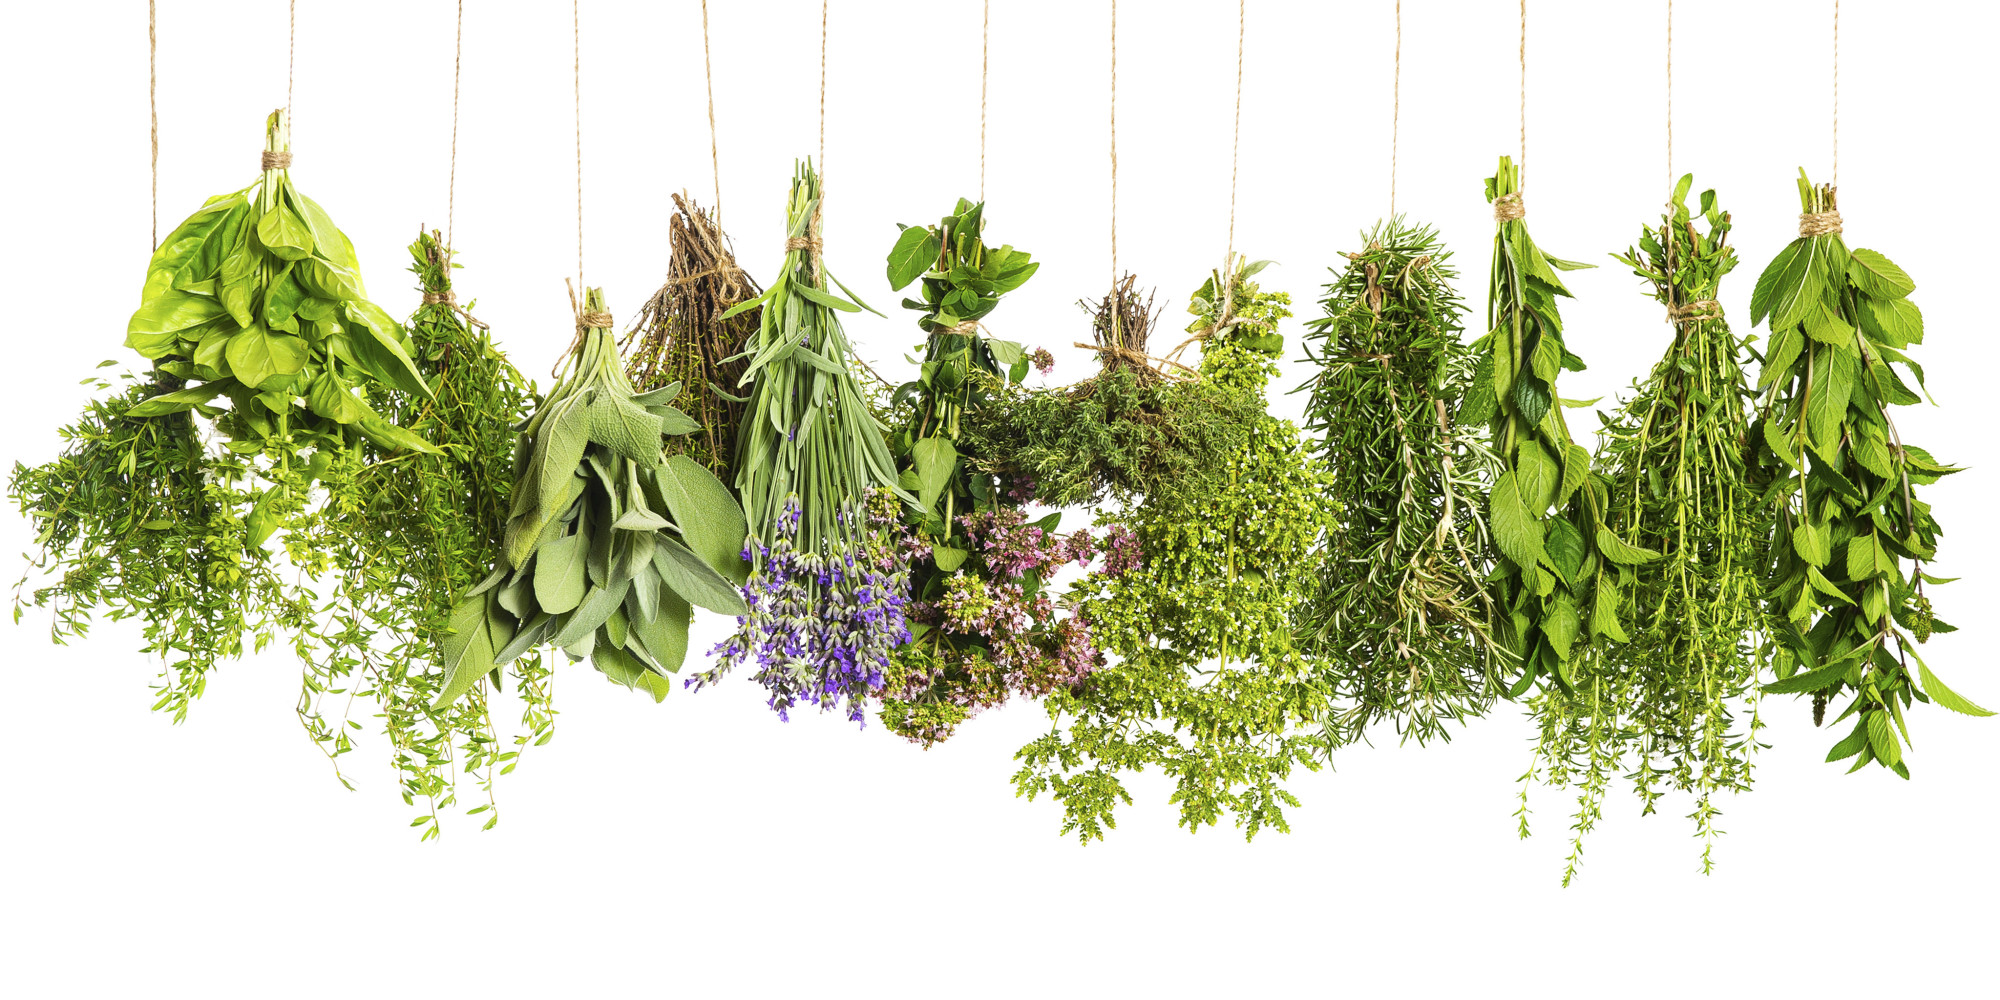 10 Popular Bulgarian Herbs Translated to English | Bulgarian Cooking